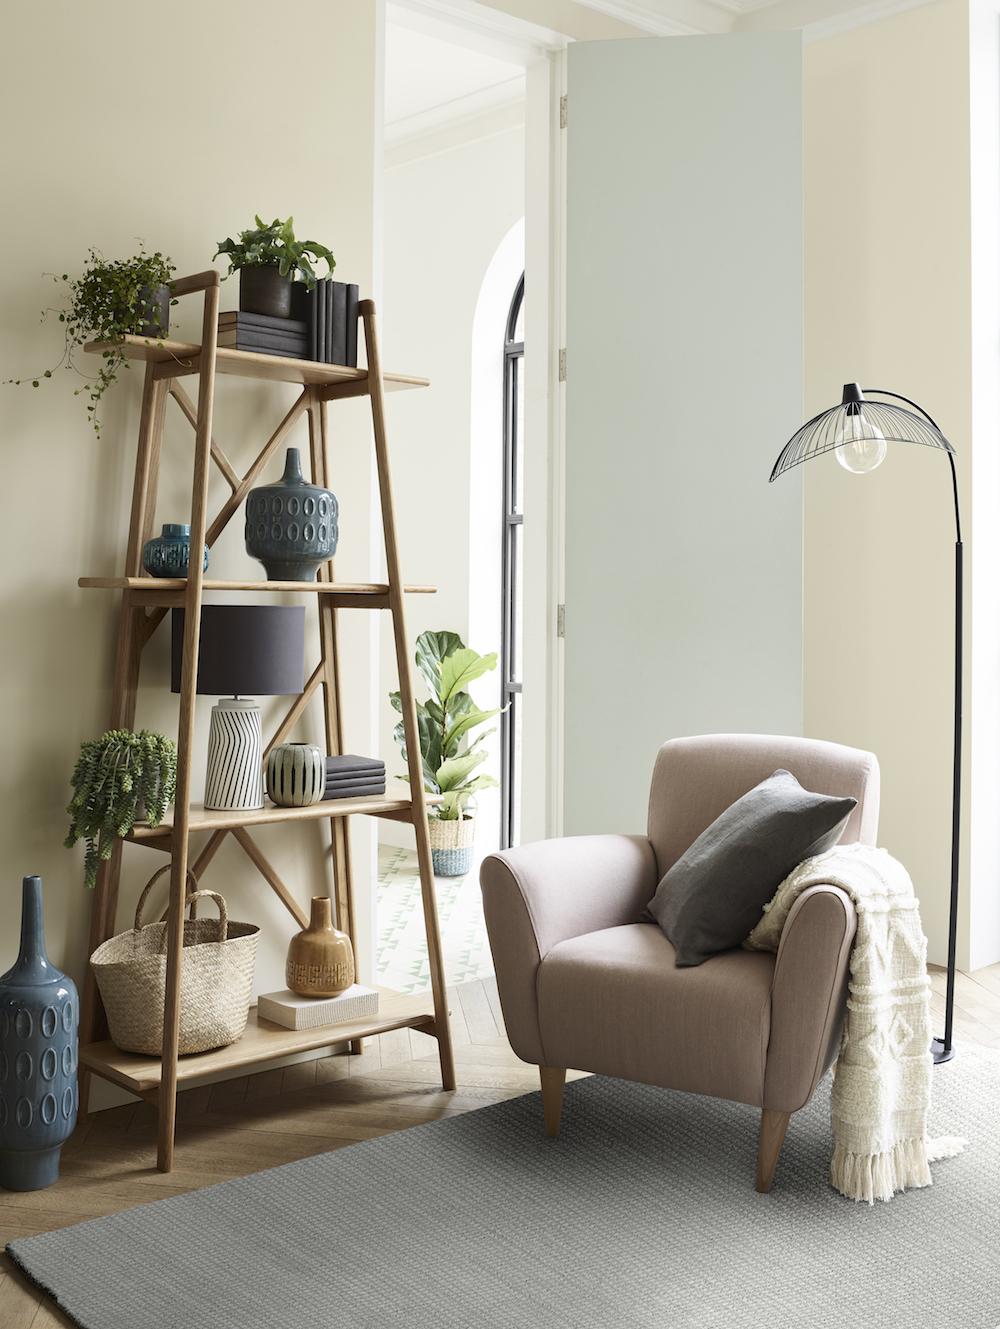 Albie Armchair, £499, Mantis Bookcase, £450, Hiko Floor Lamp, £140, Ziggy Table Lamp, £75